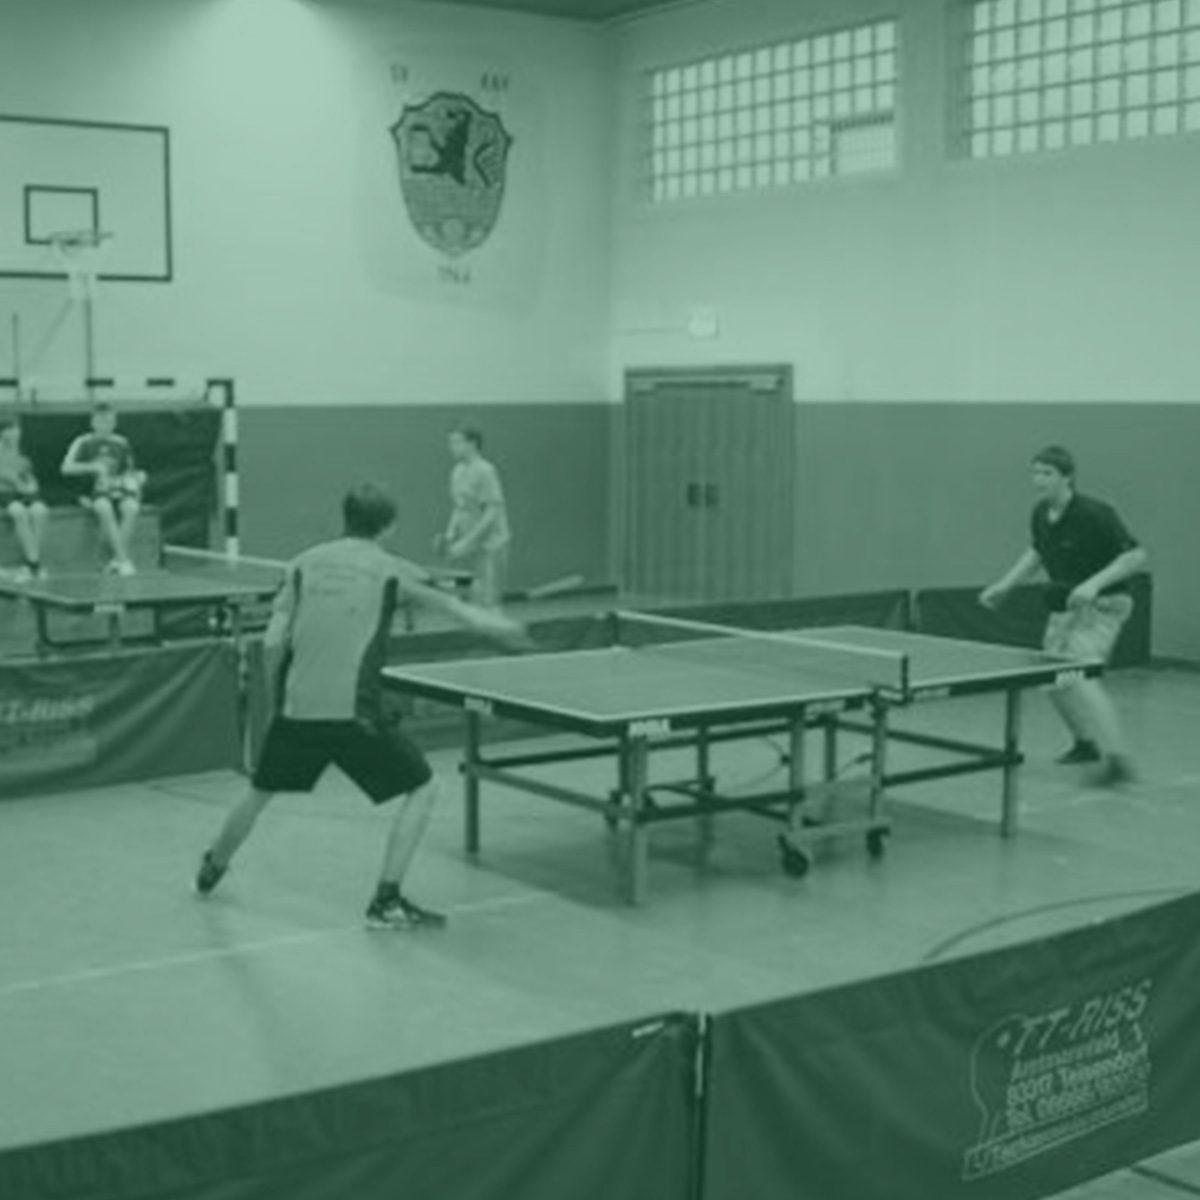 https://www.svkay.de/wp-content/uploads/2019/05/tischtennis-thumb_1200x1200-e1566324902570.jpg